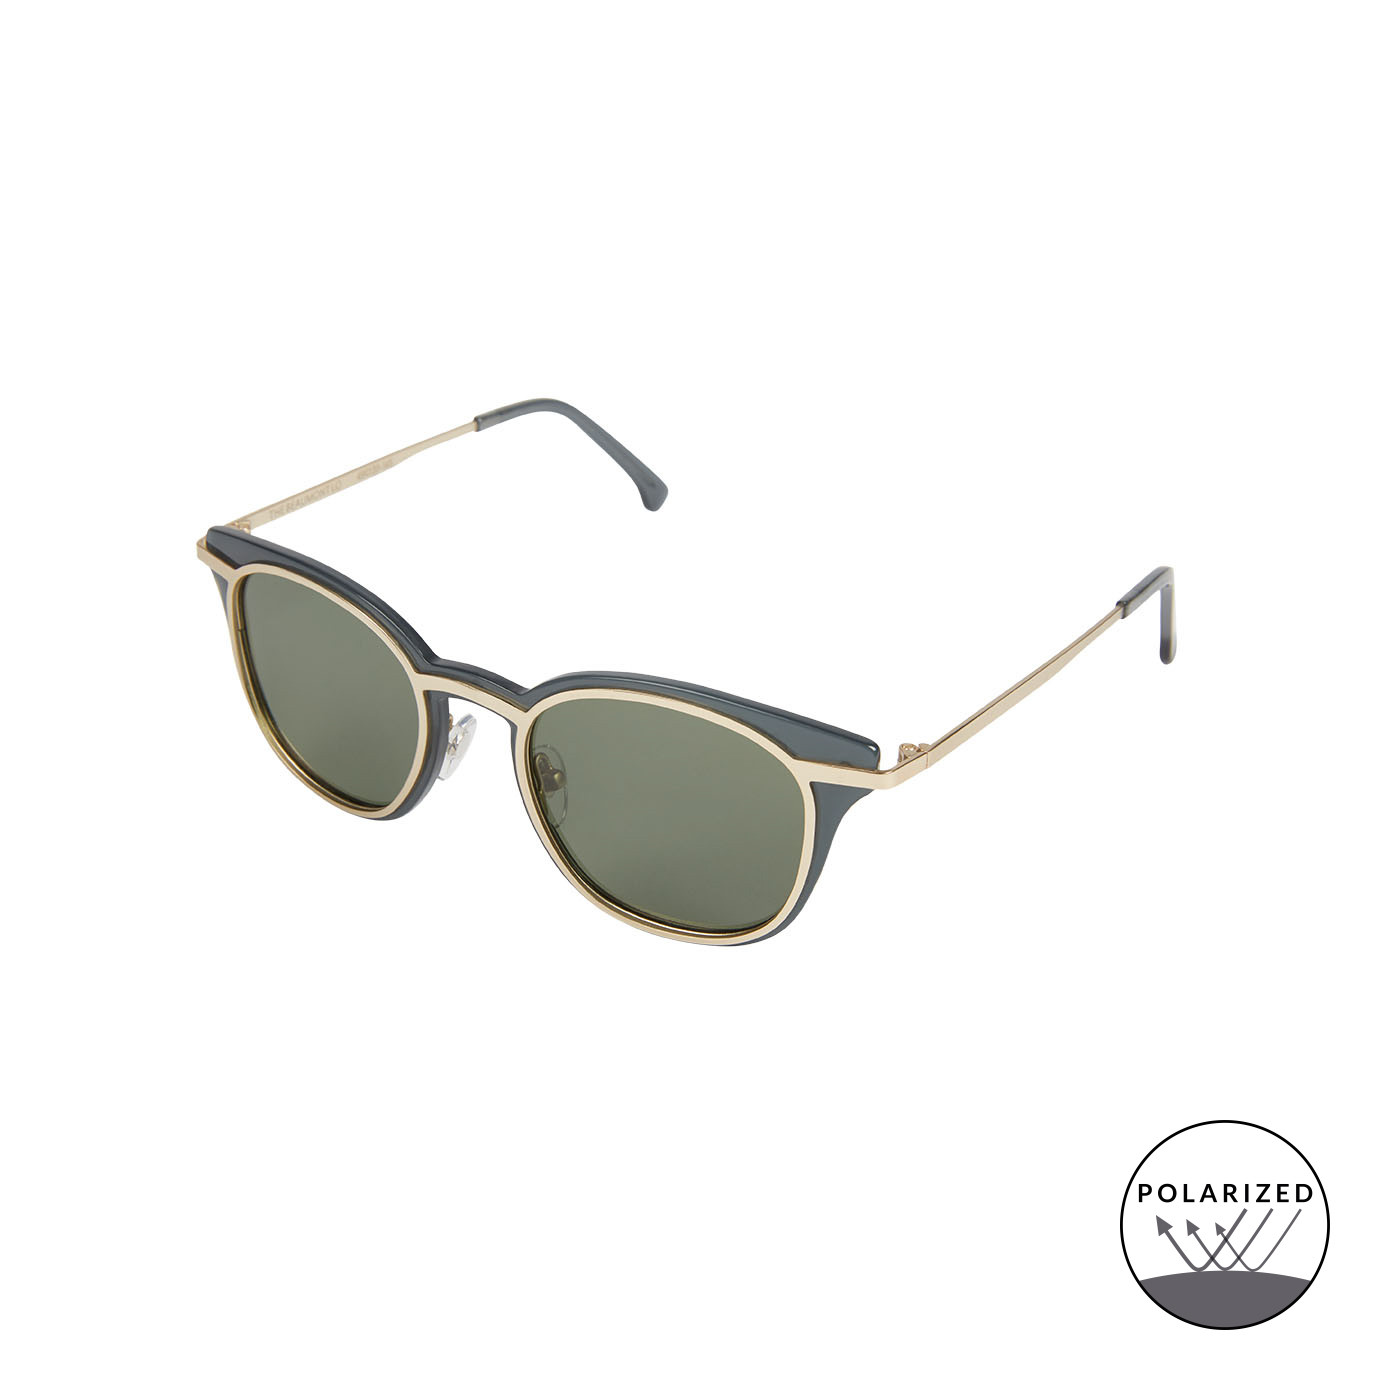 1a5a145b4c37 Komono Sydney Hunter Polarized Sunglasses KOM-S4751 - Sunglasses